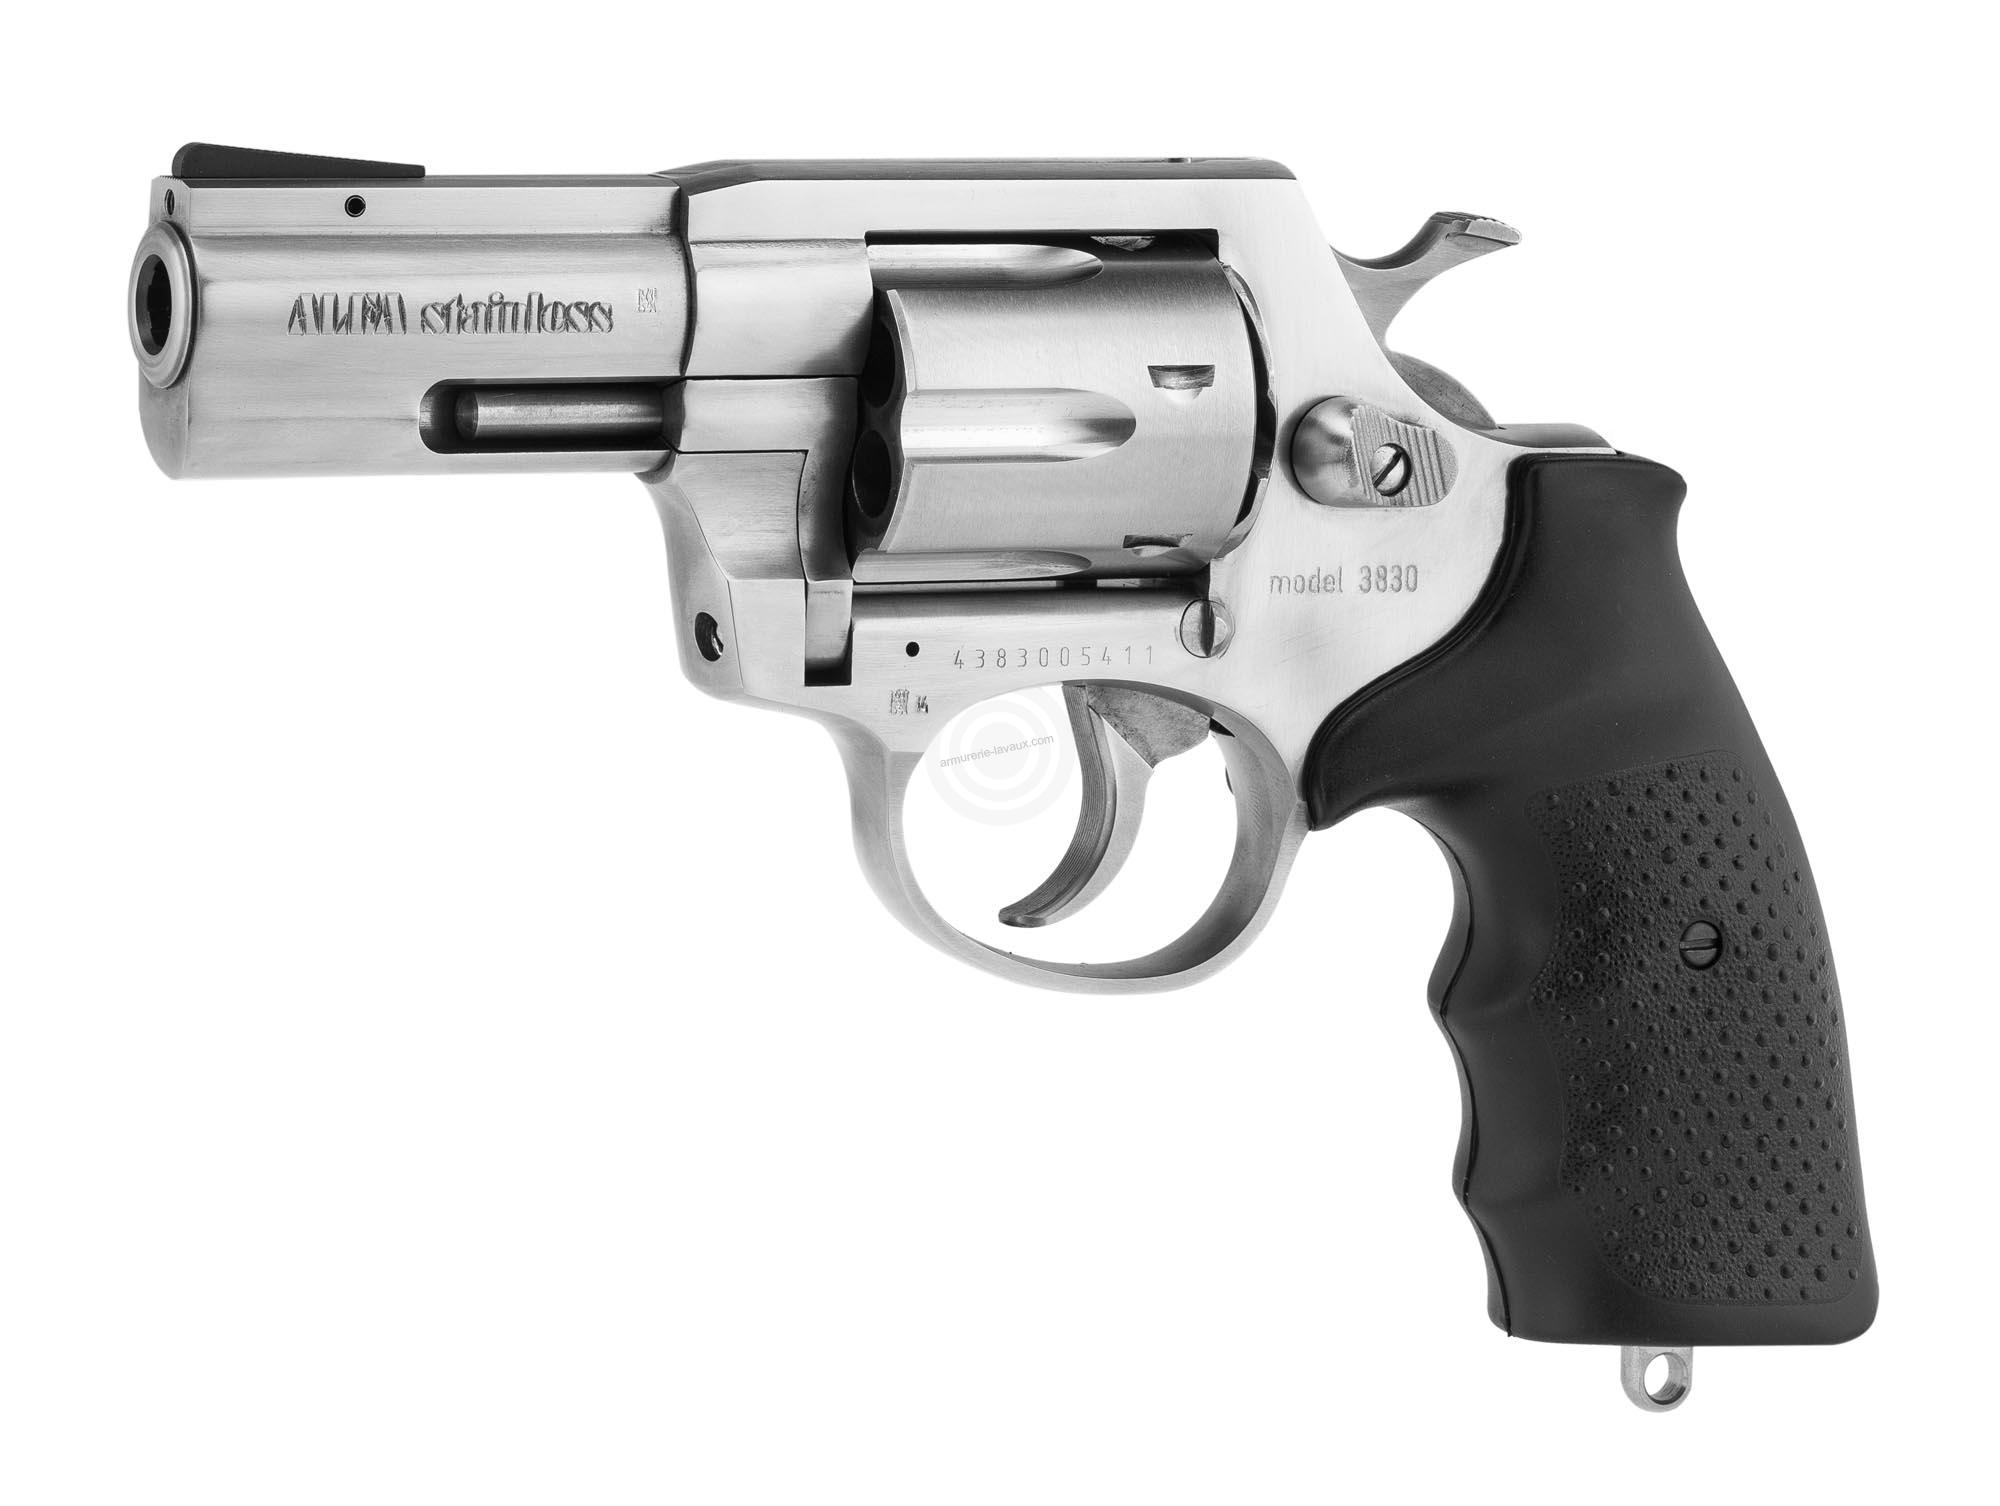 Revolver ALFA PROJ mod.3830 3'' inox cal.38 Spécial